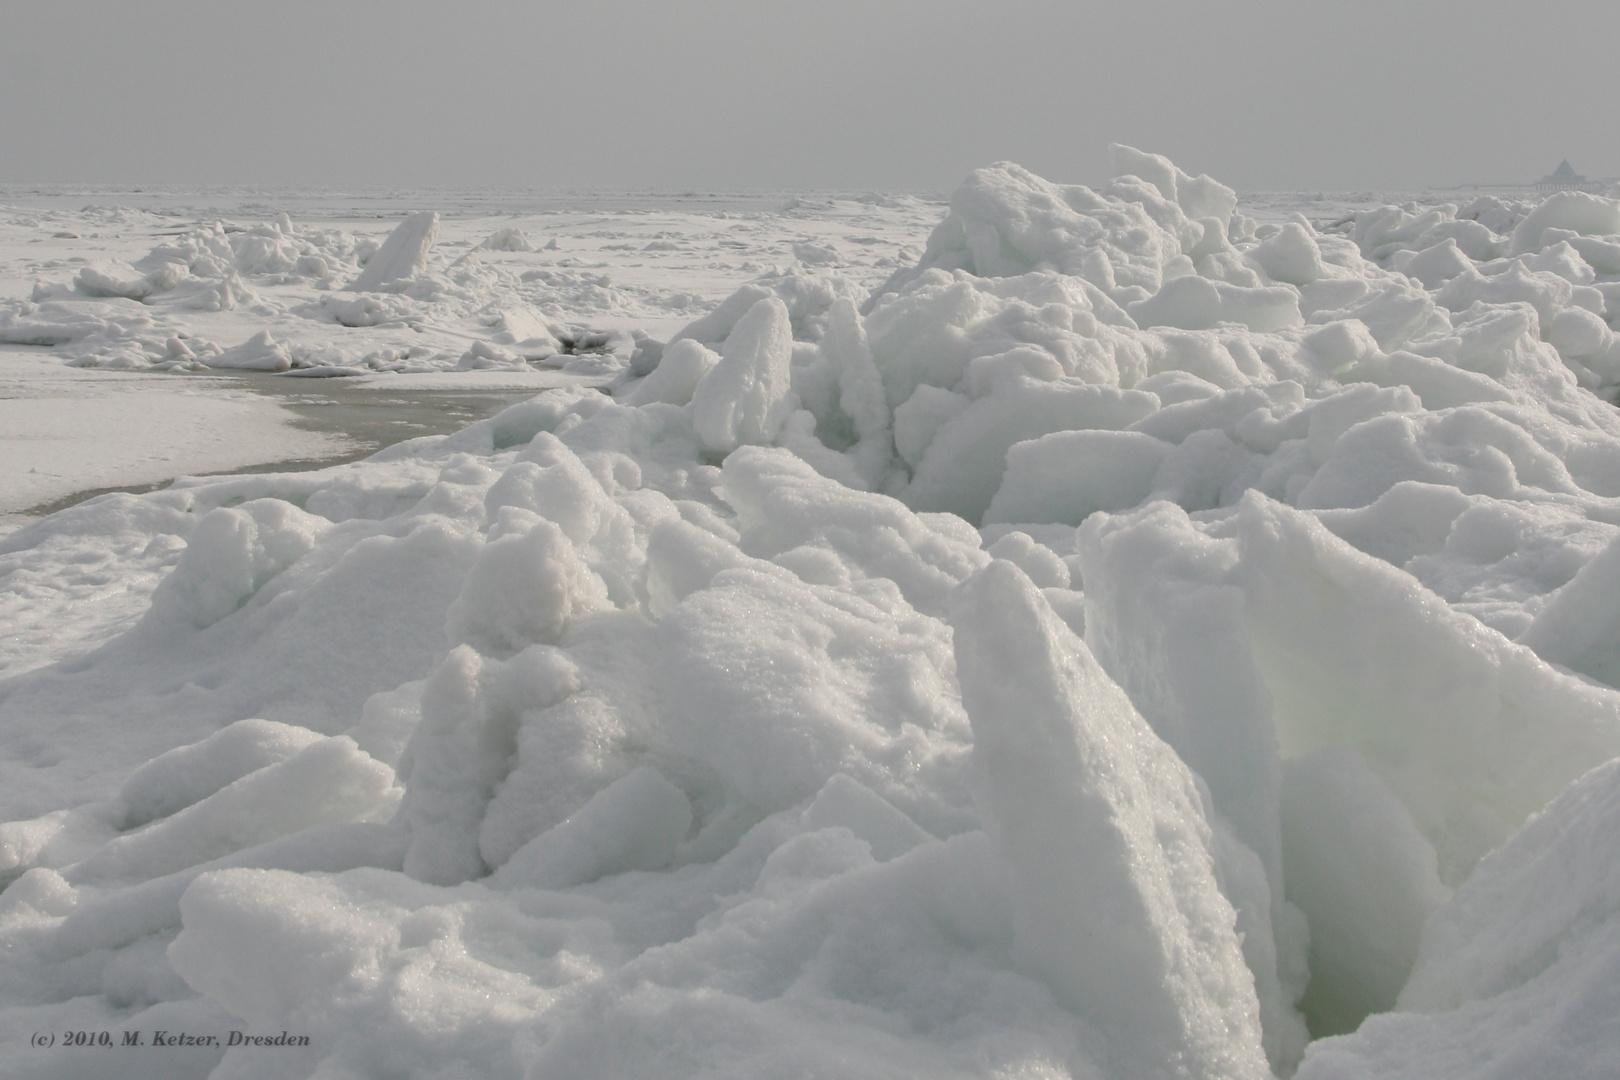 Am Ostseestrand im Februar